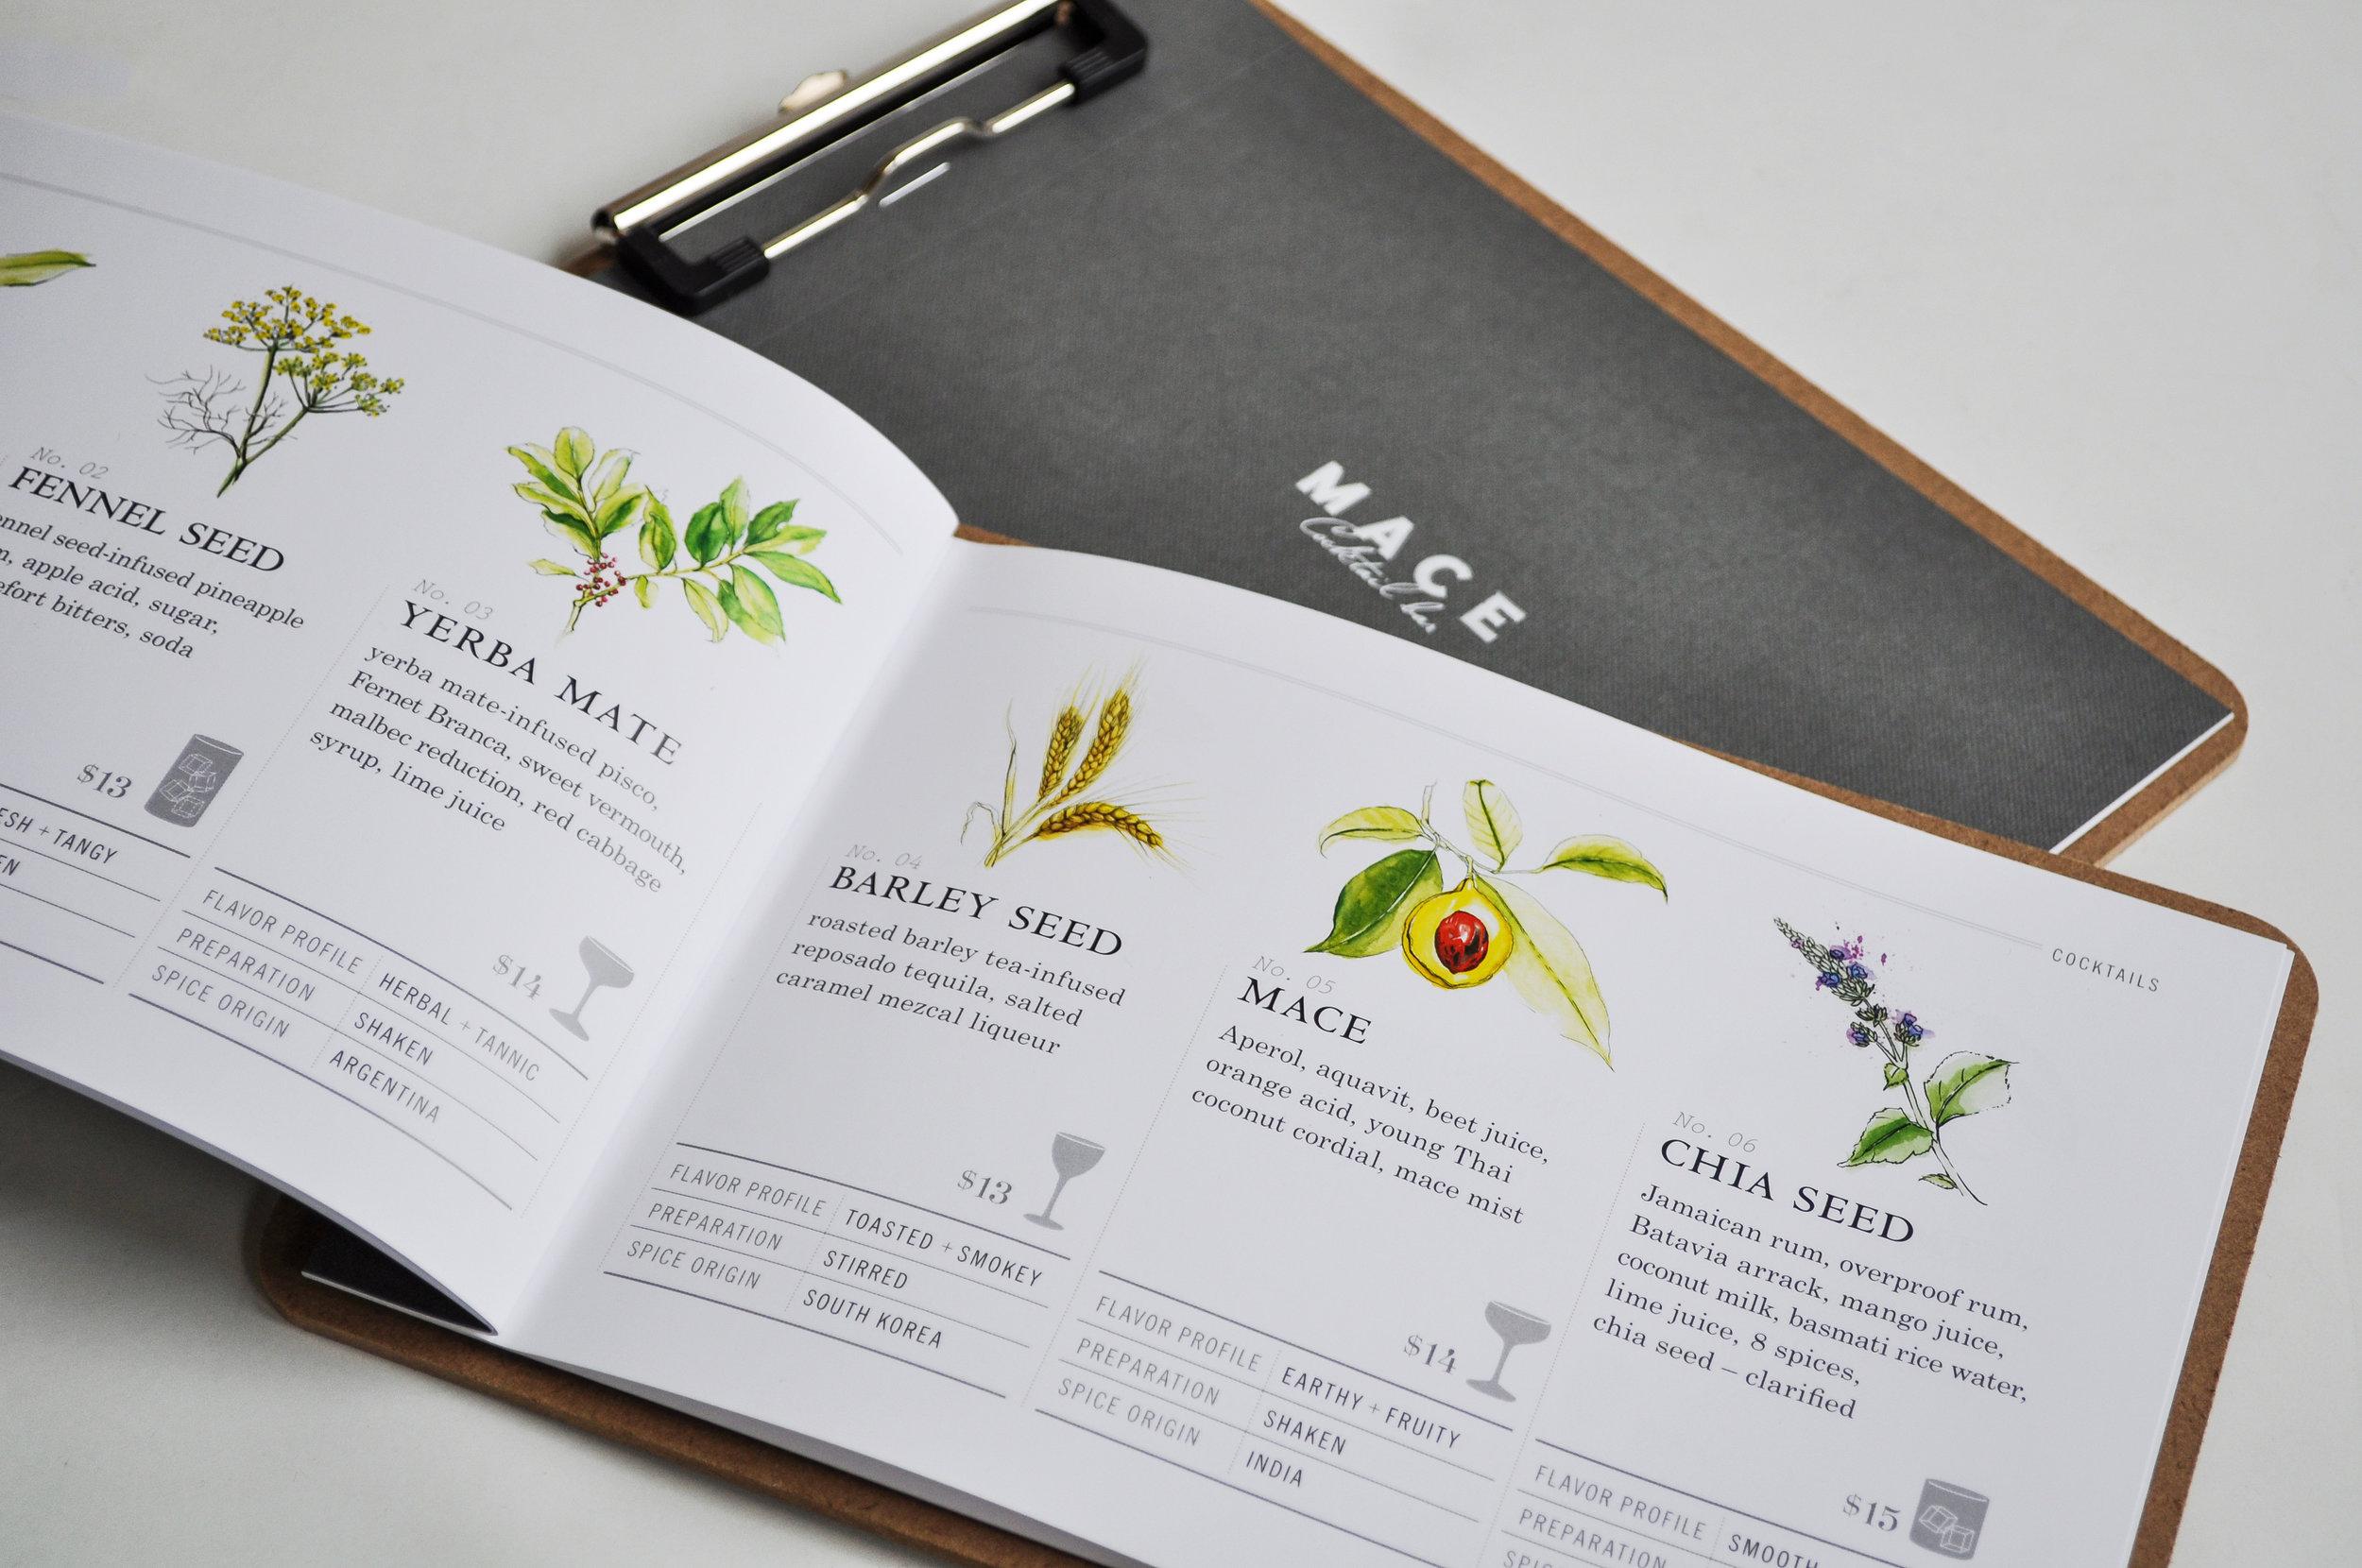 Mace-menu_jk0909_spring2016.jpg